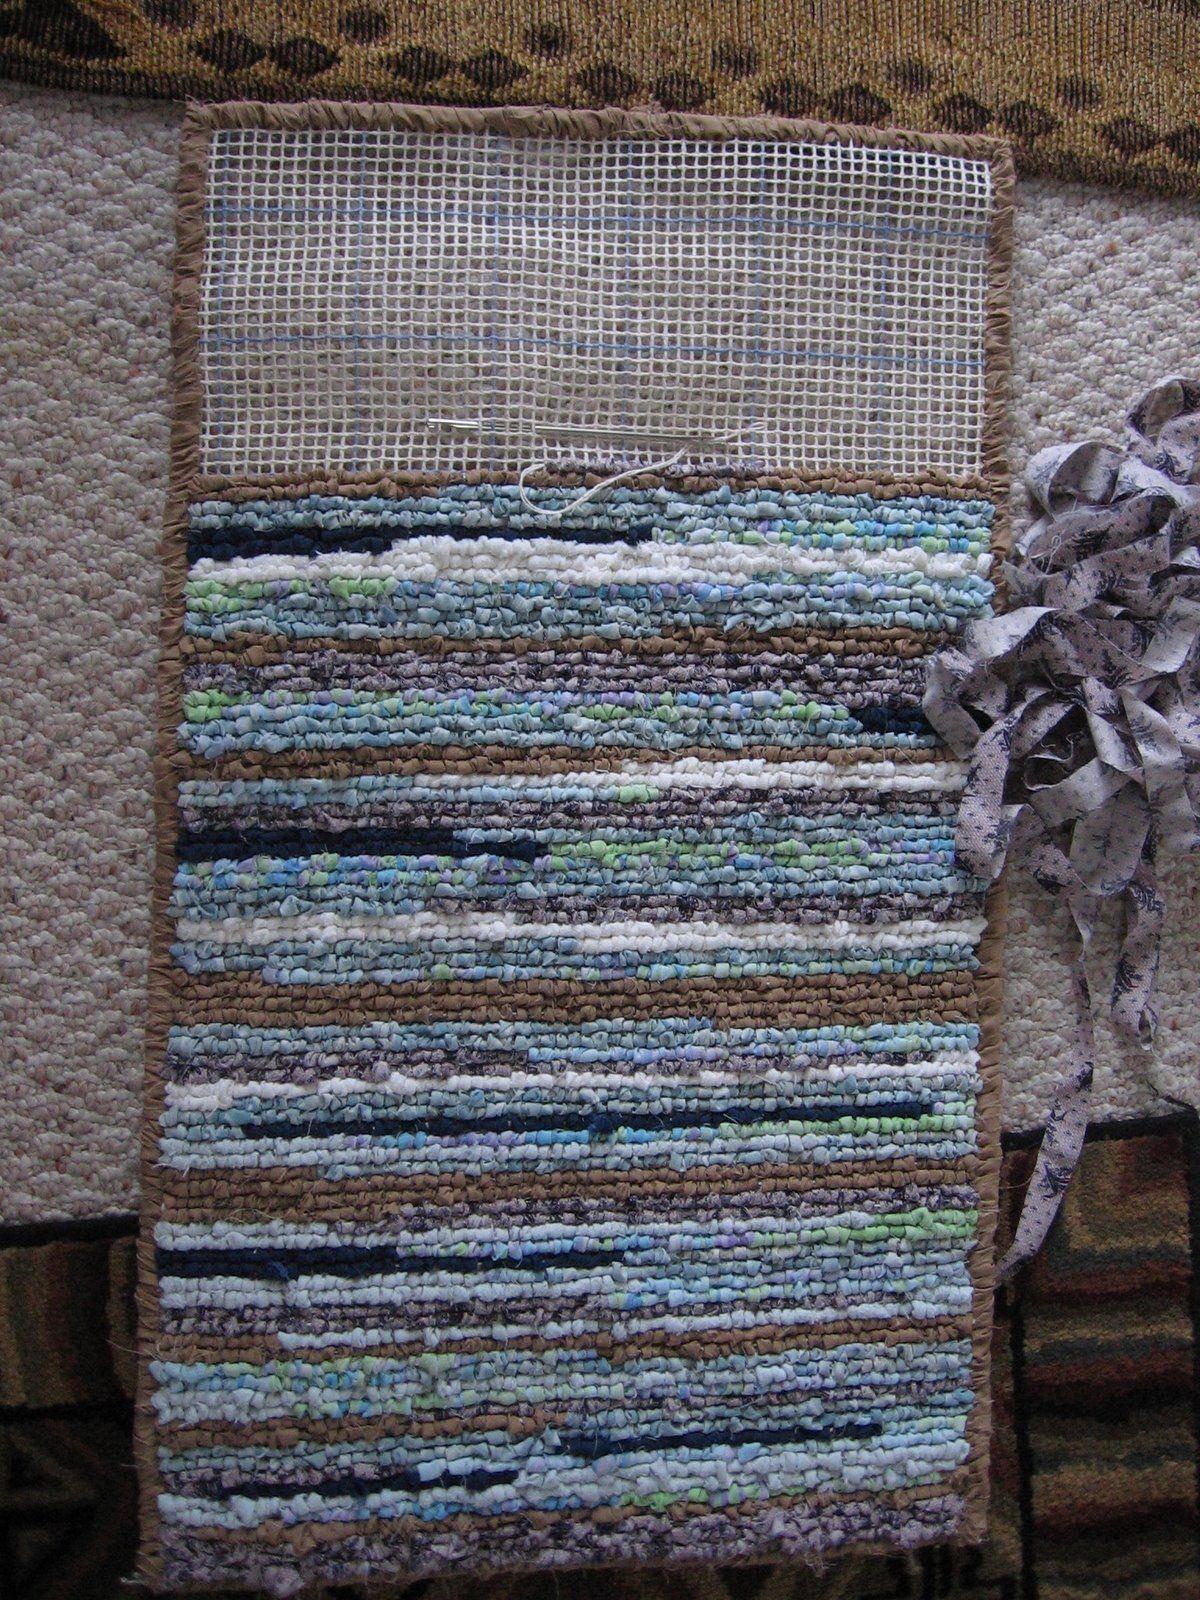 Pin By Africa Bonilla On Reciclando Teppich Häkeln Häkeln Nähen